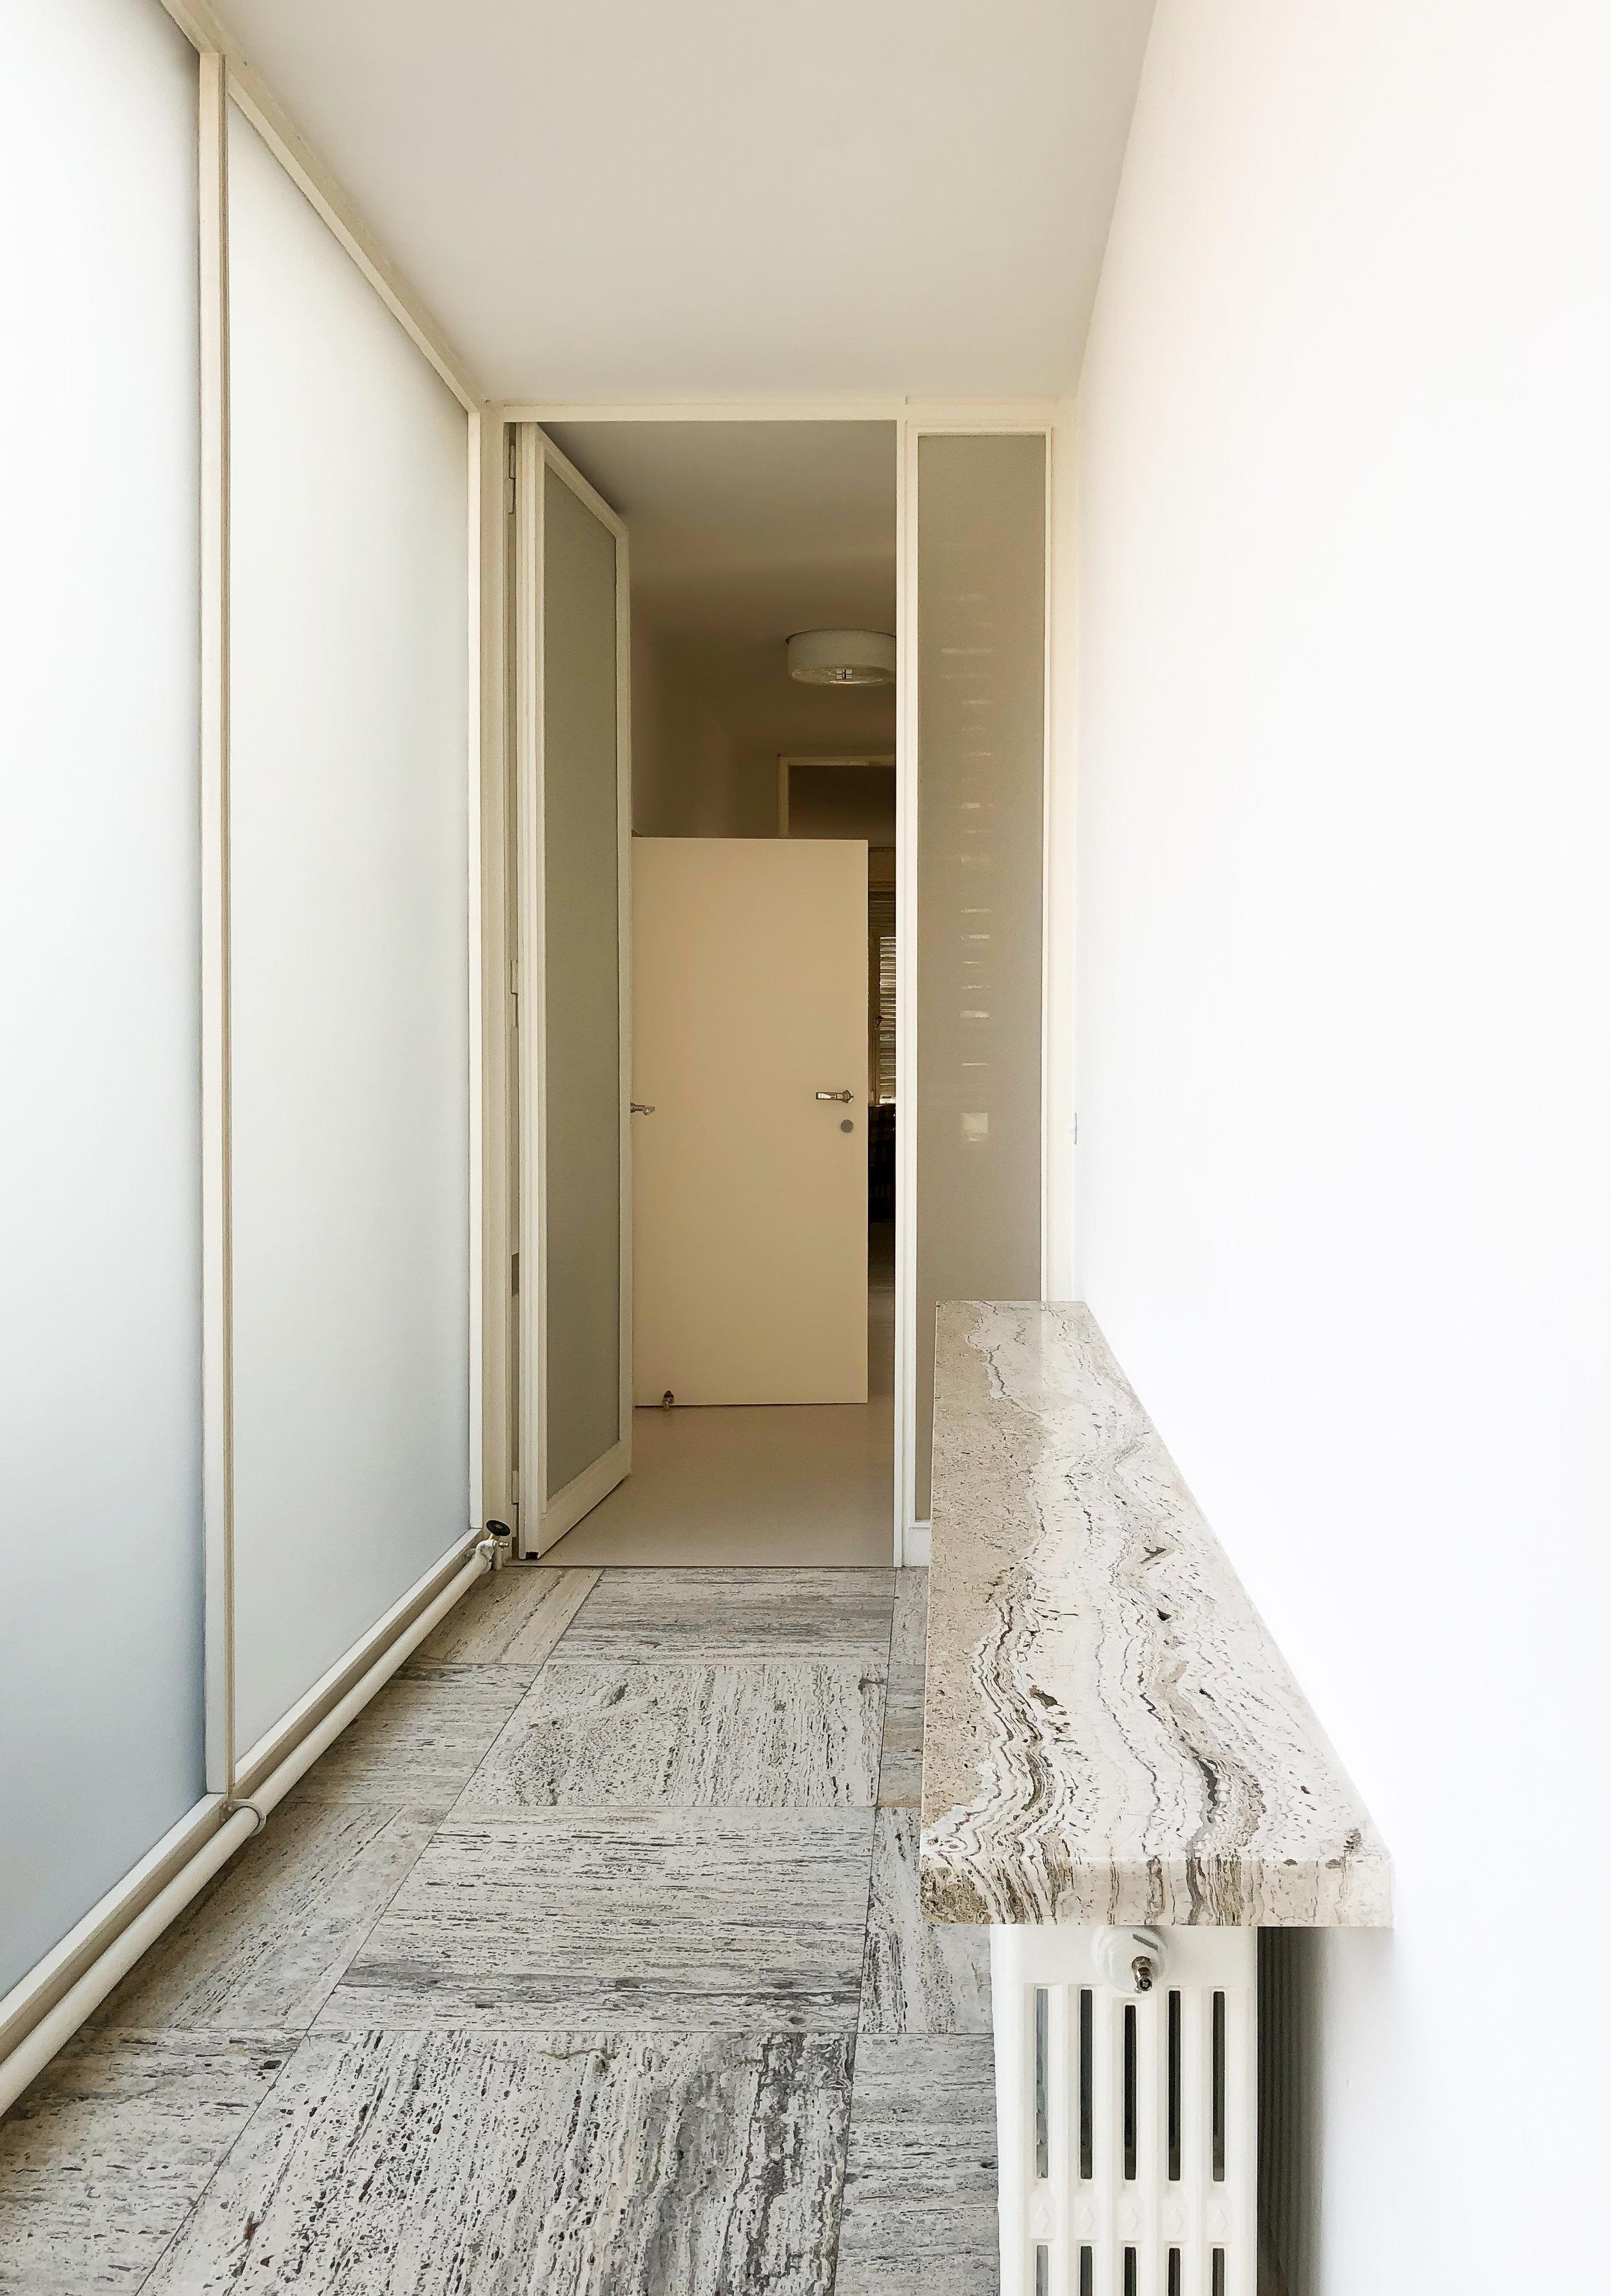 CORRIDOR TO PRIVATE ROOMS